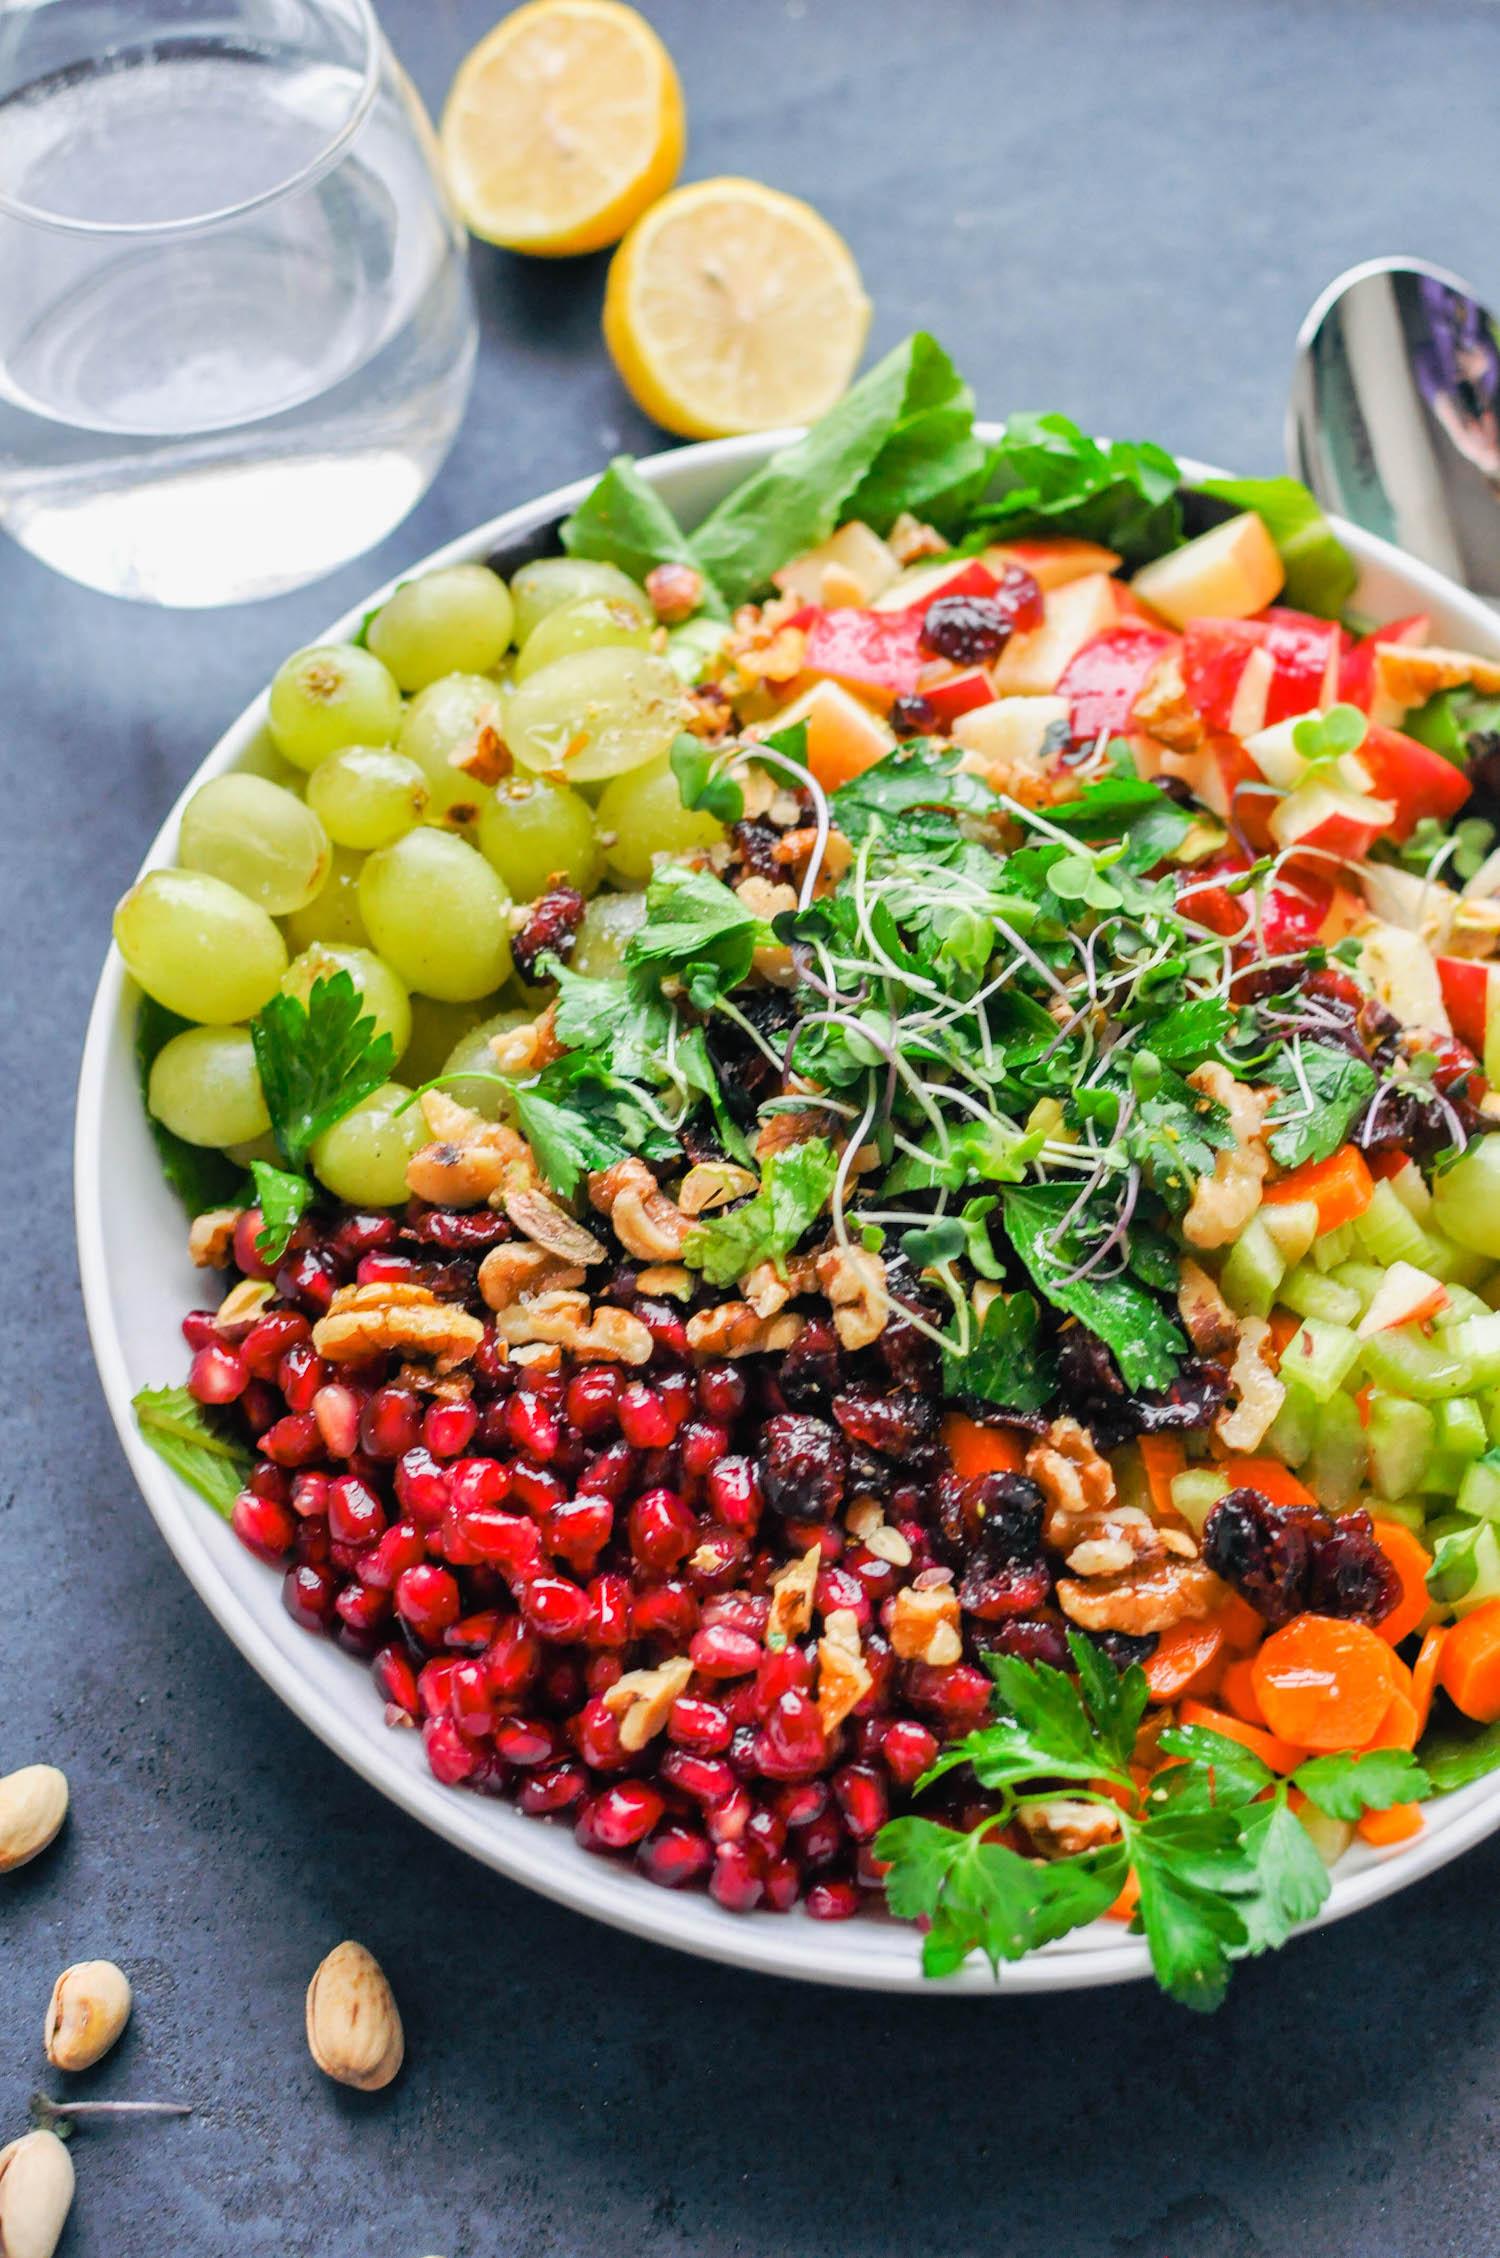 Detox Crunch Salad. A vegan salad full of grapes, apples, celery, pistachios, pomegranates, walnuts, and carrots. | This Healthy Table